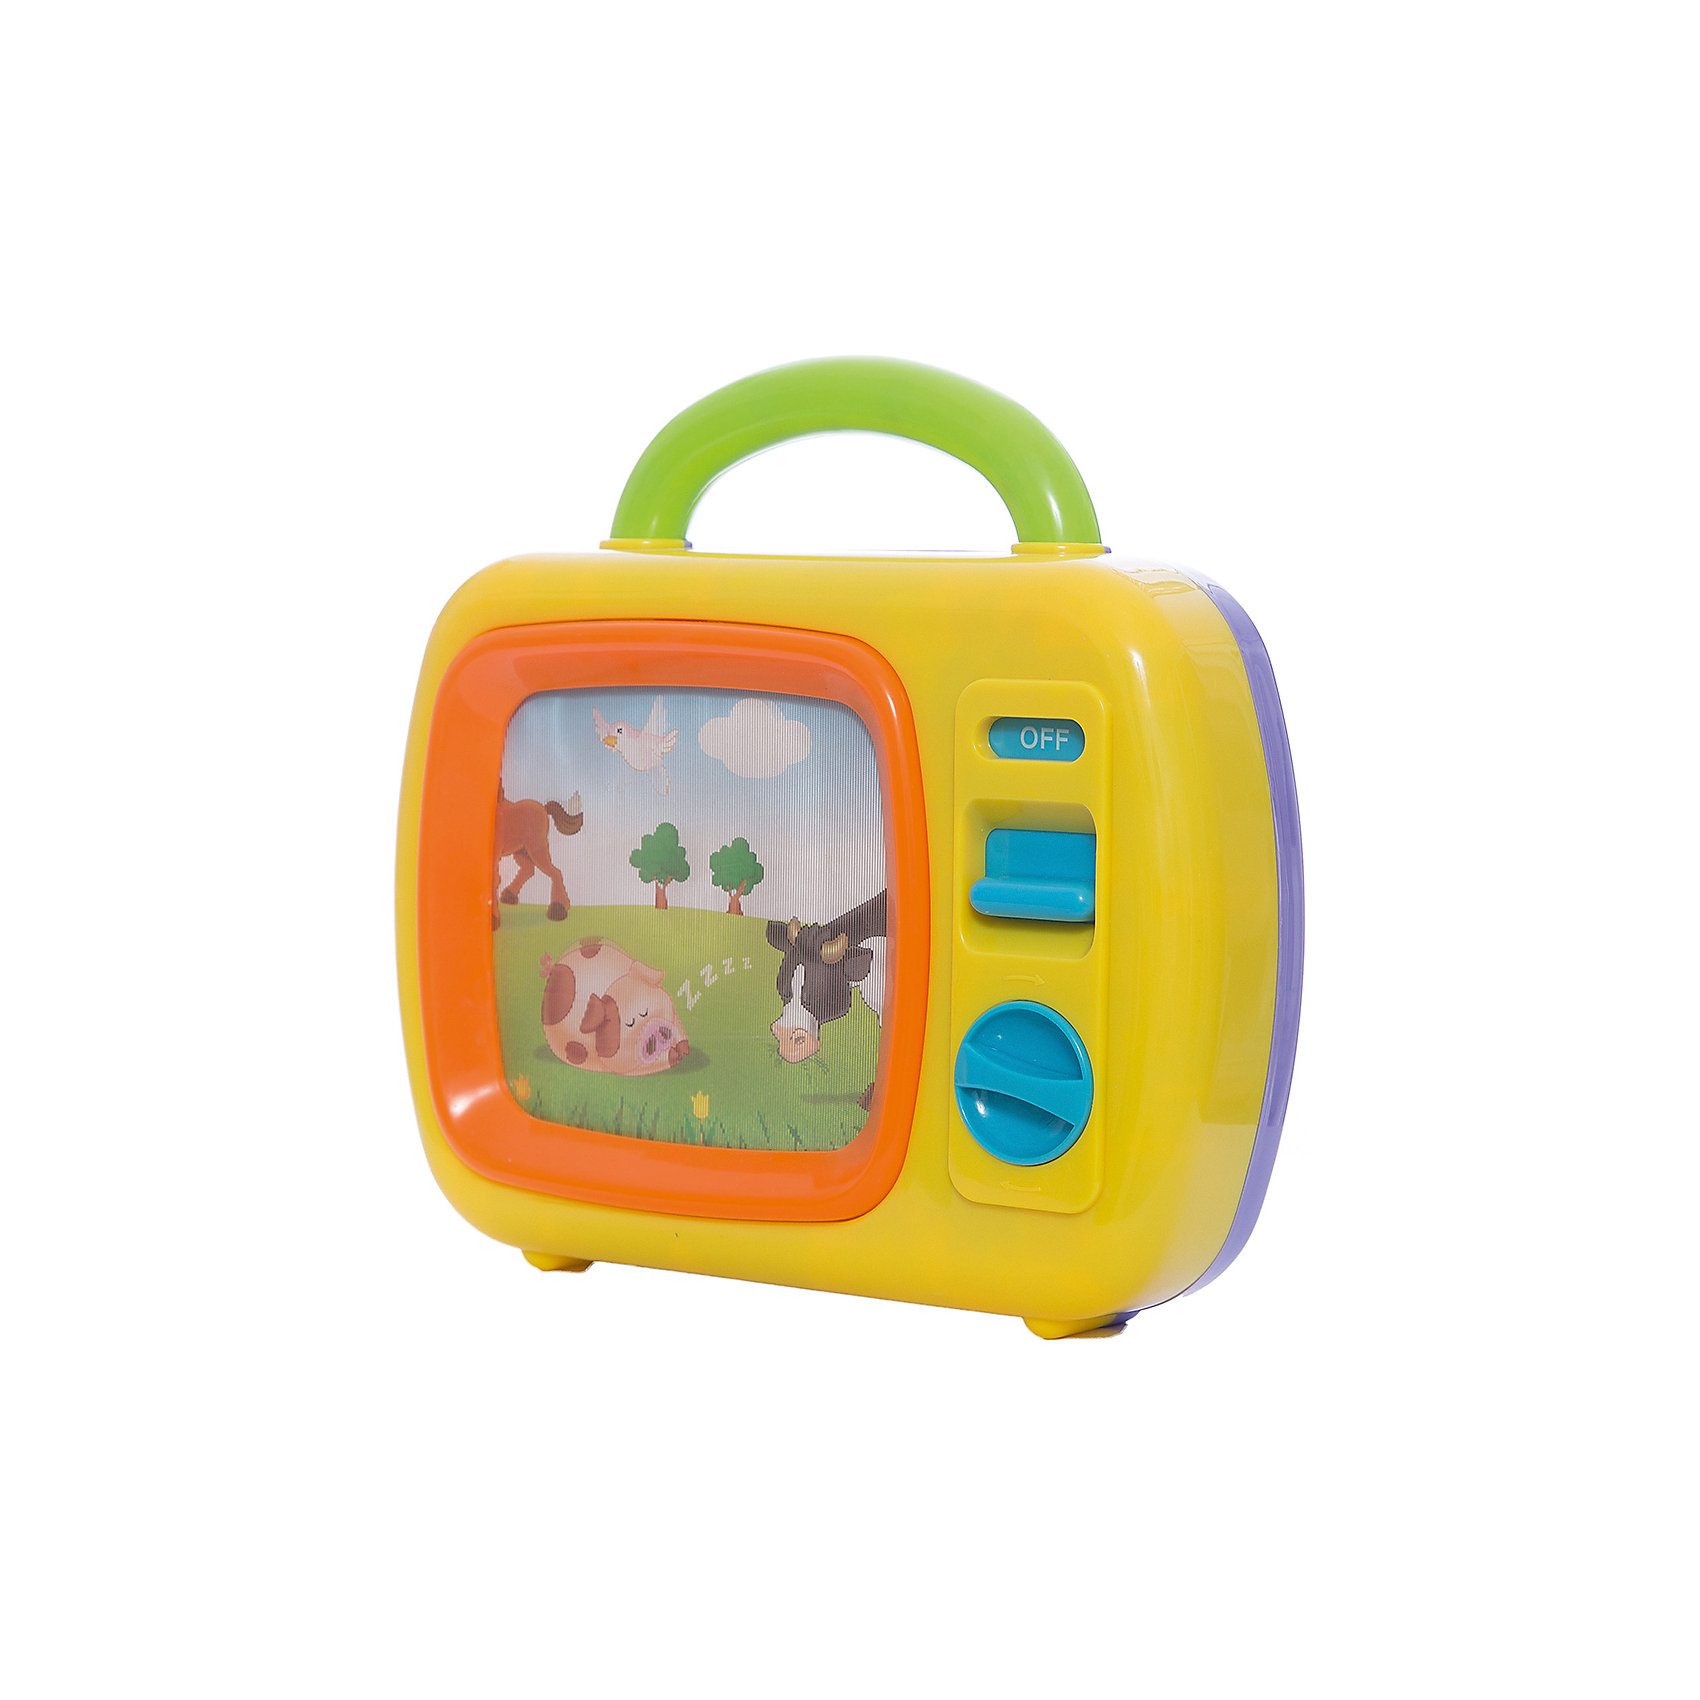 - Развивающий центр Телевизор - Животные, Playgo центр развивающий playgo телевизор 2196